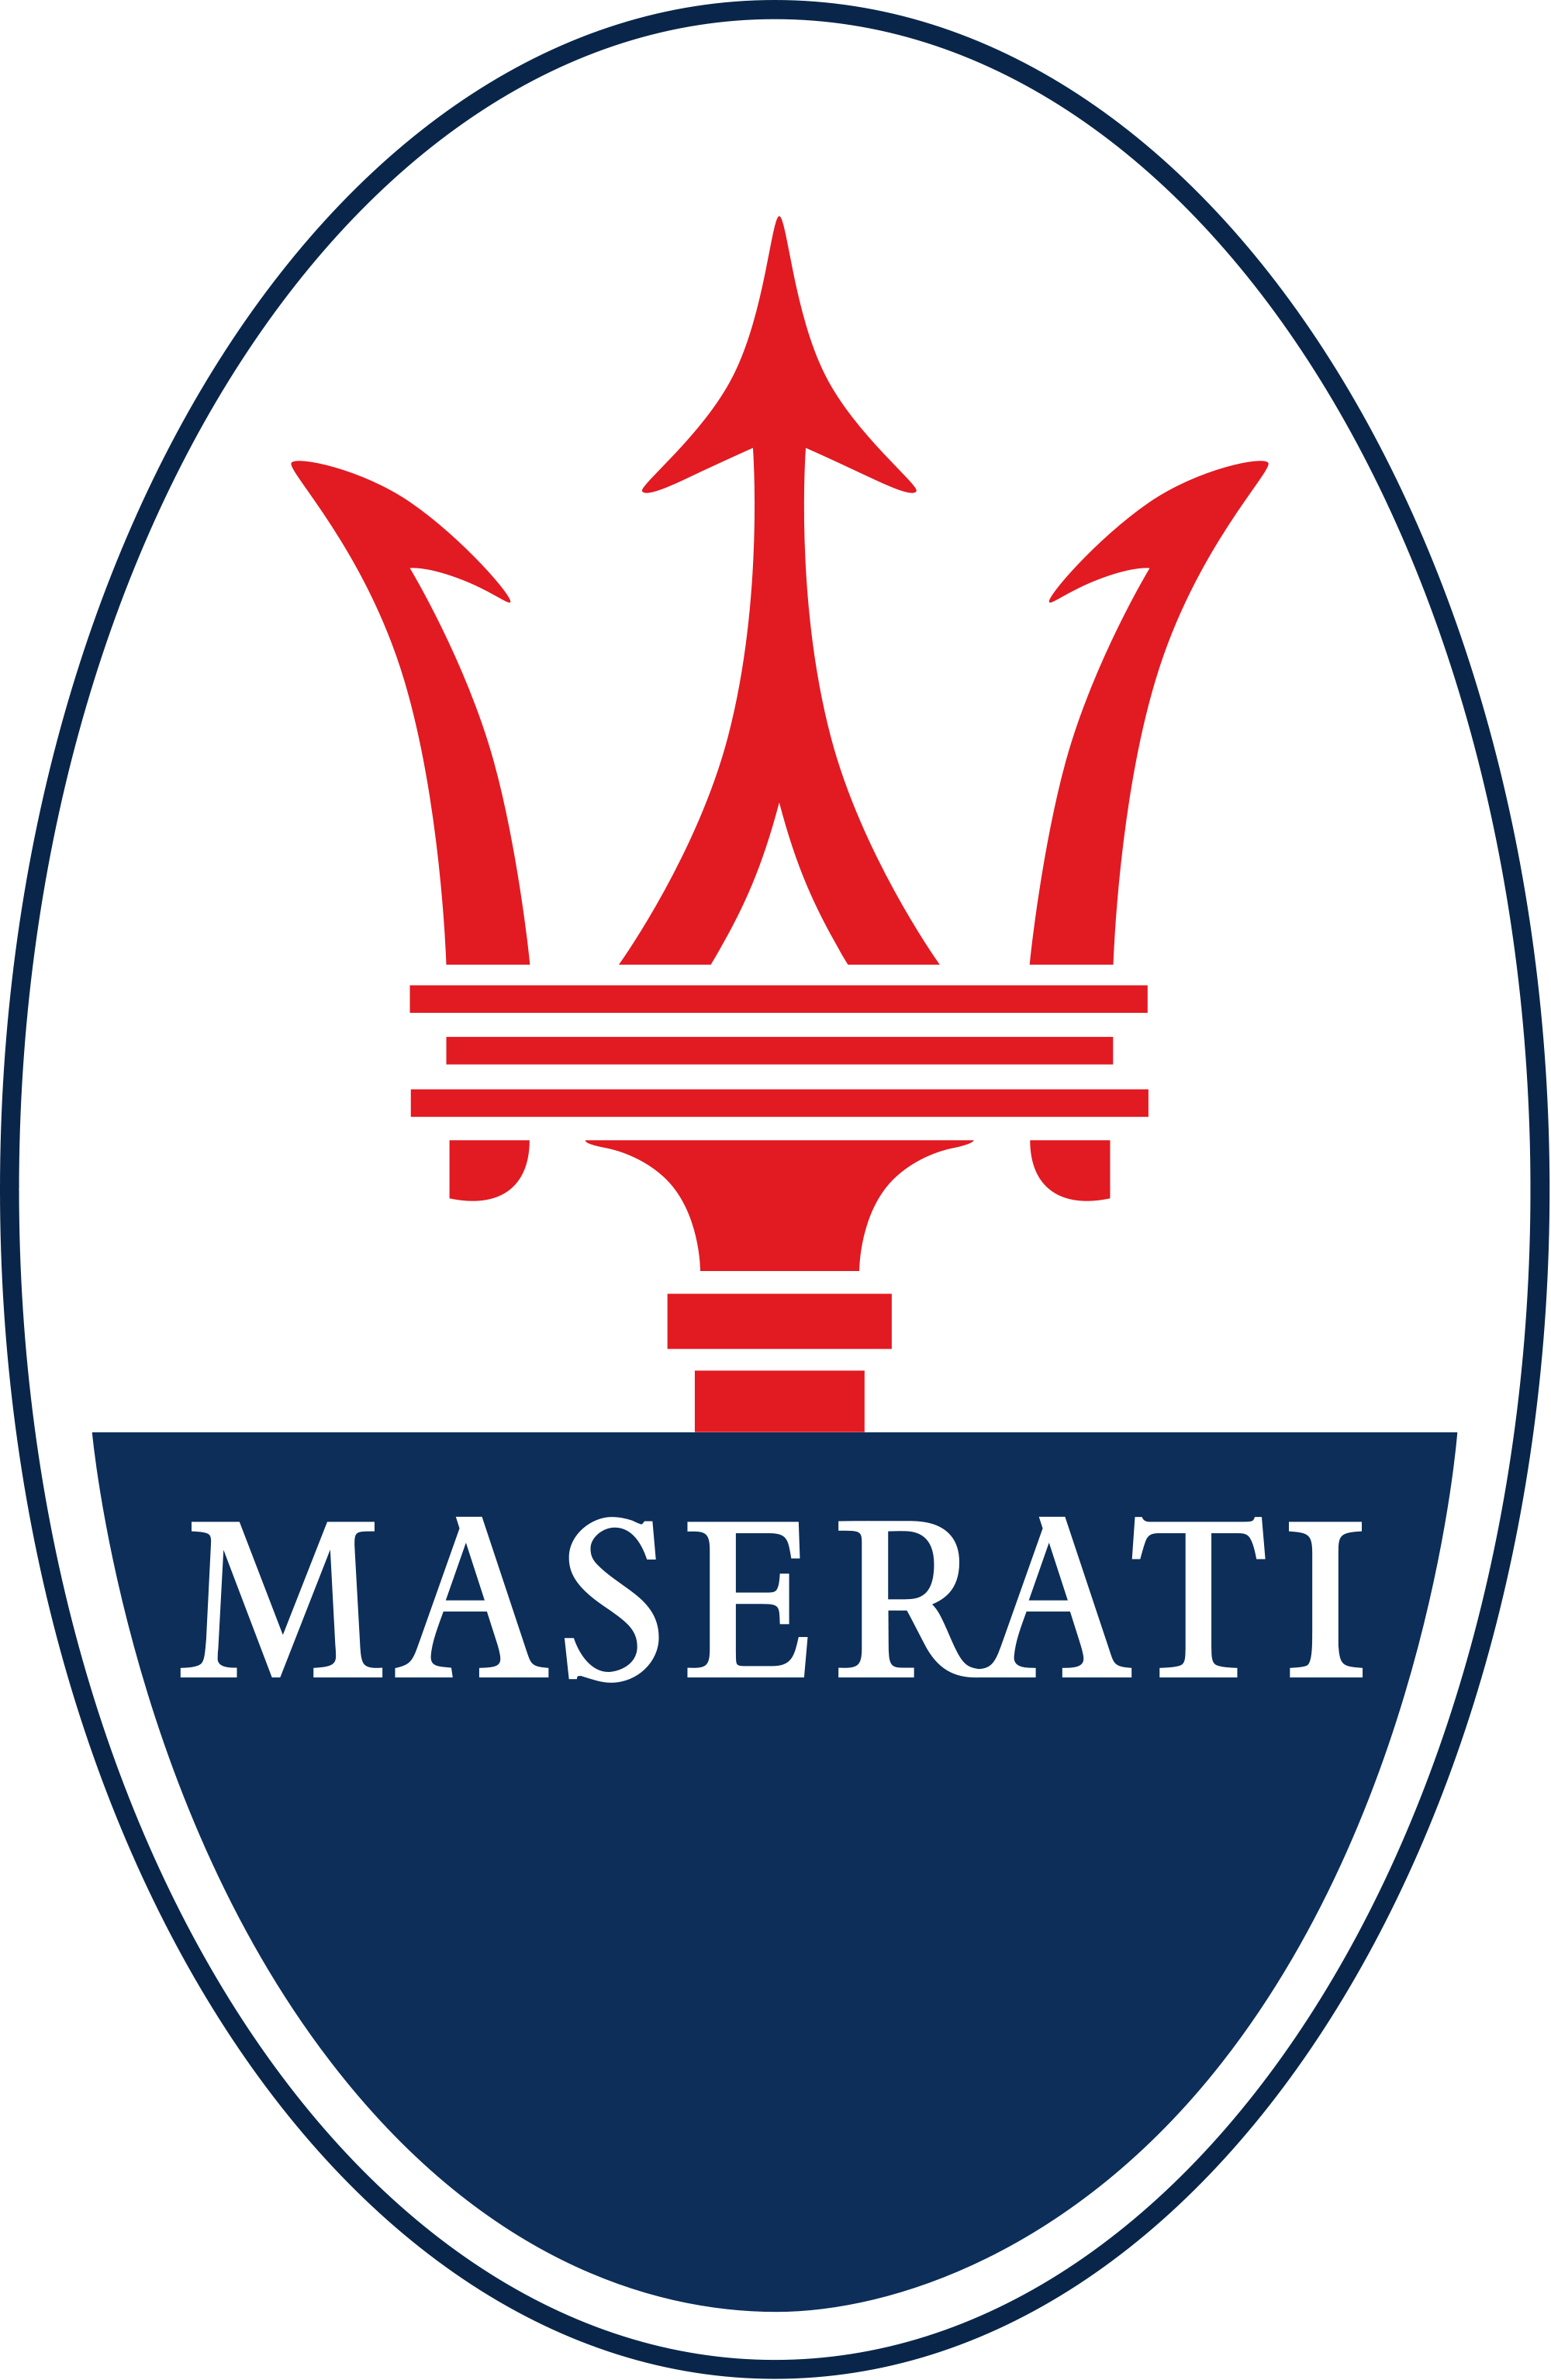 logo of maserati